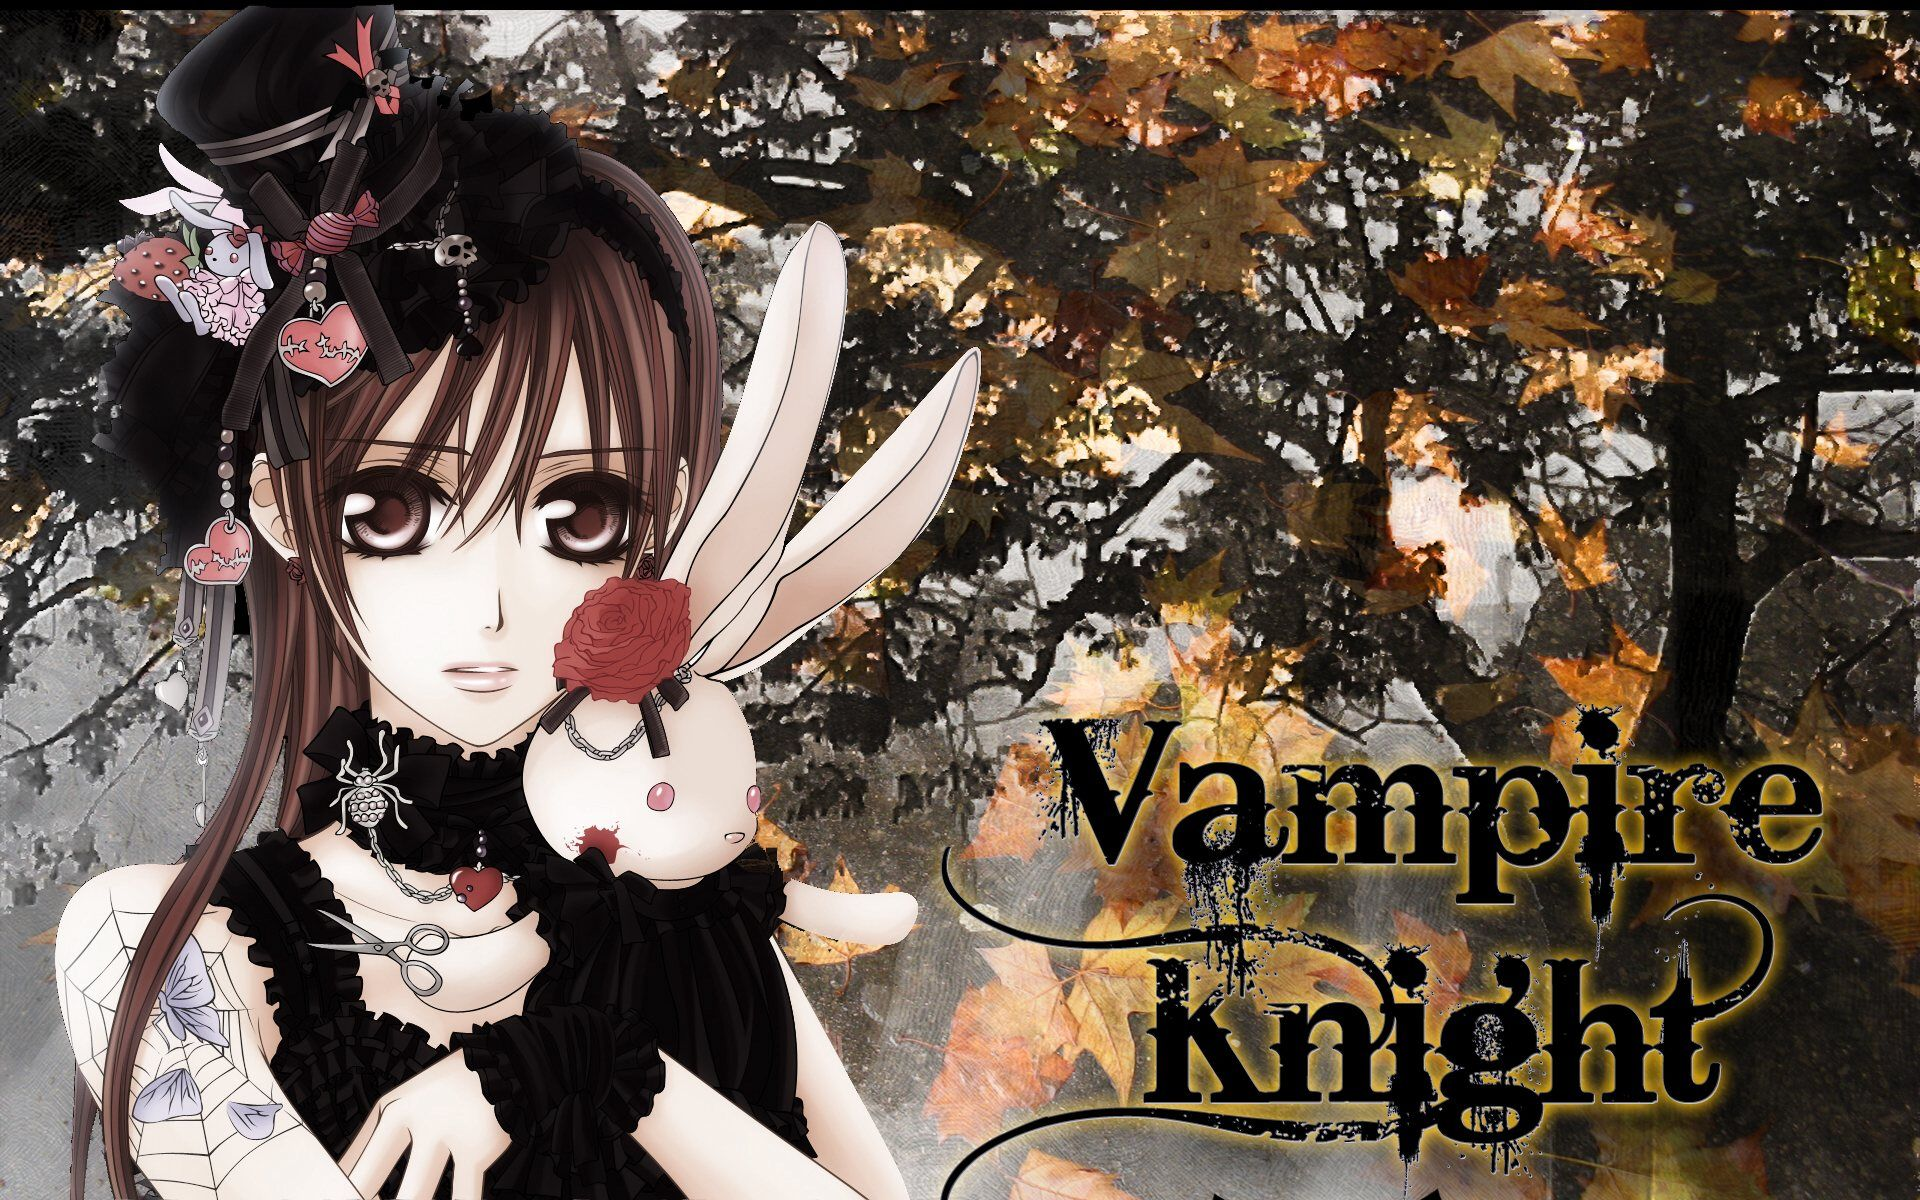 Vampire Knight Chibi Wallpapers Wallpapers Wallpapers And Vampire Knight Anime Vampire